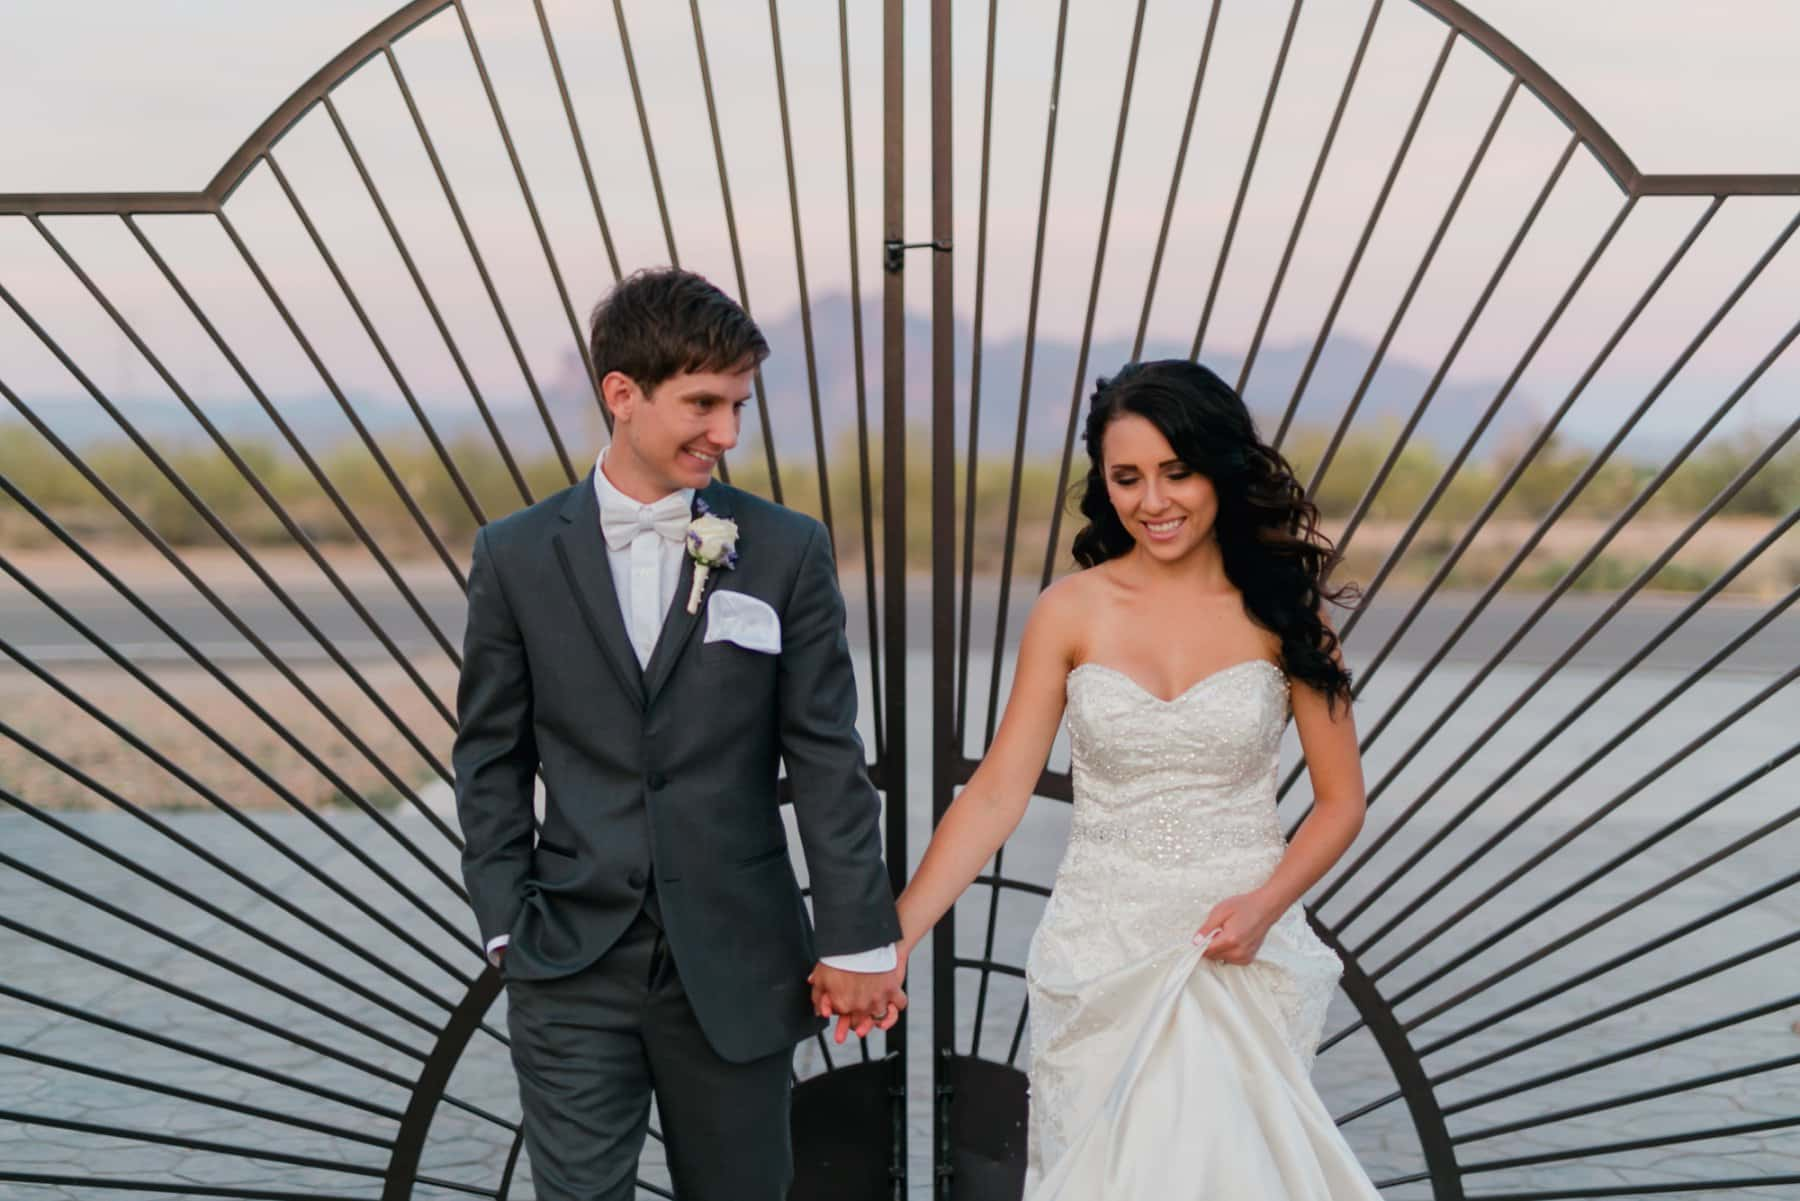 Superstition Manor wedding photographer